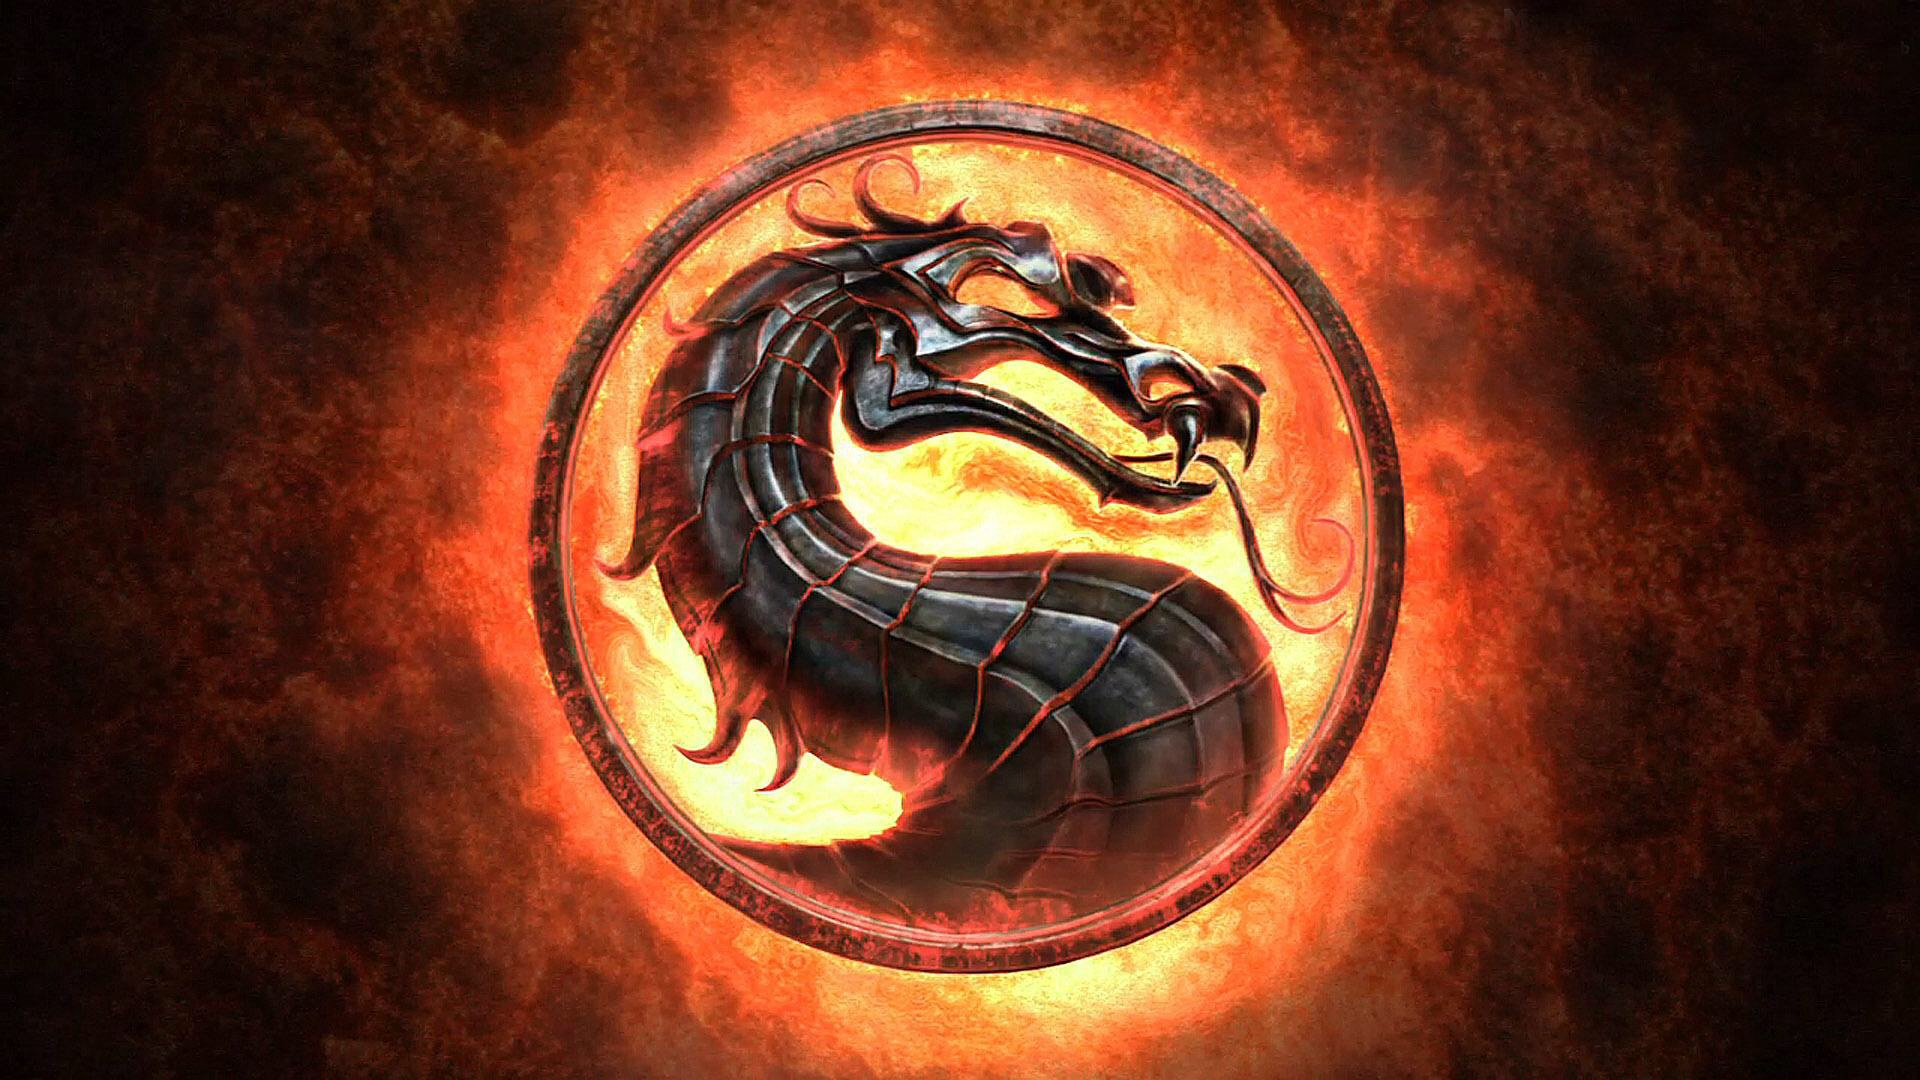 Mortal Kombat Logo - Видеоигры фото (37414415) - Fanpop